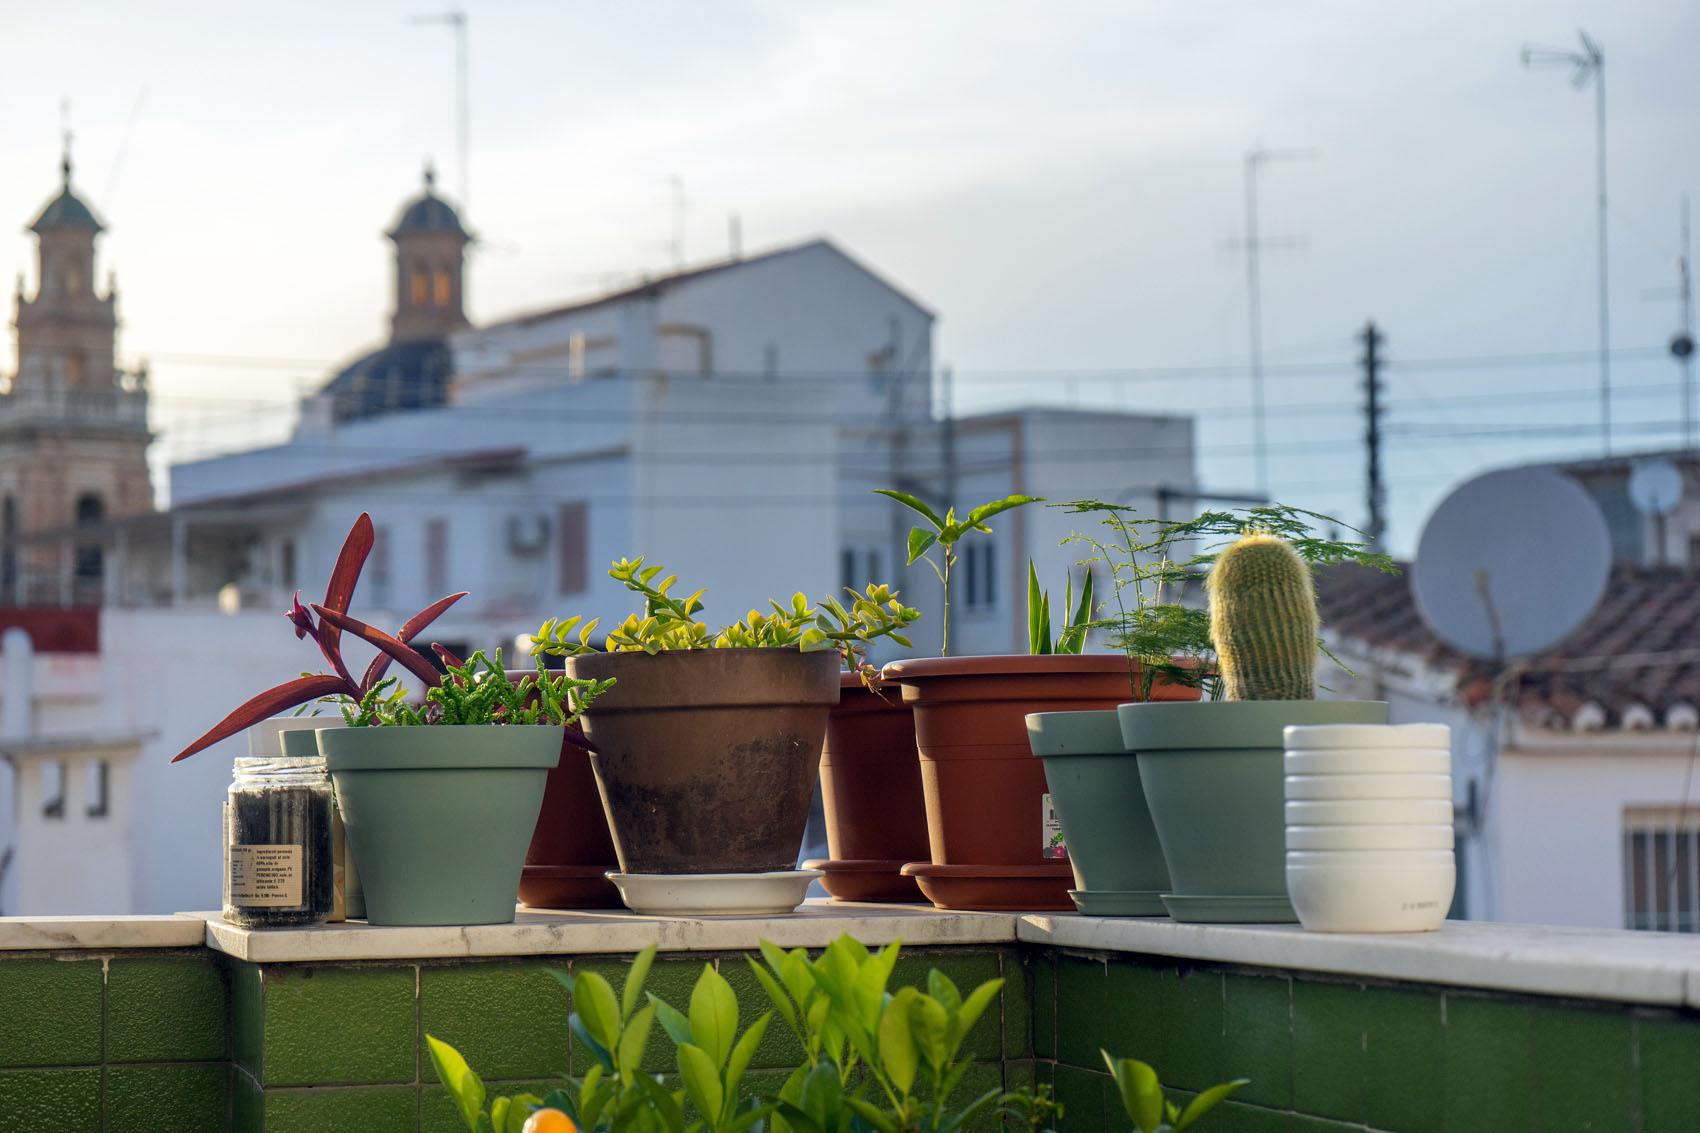 Terrace plants stock photo